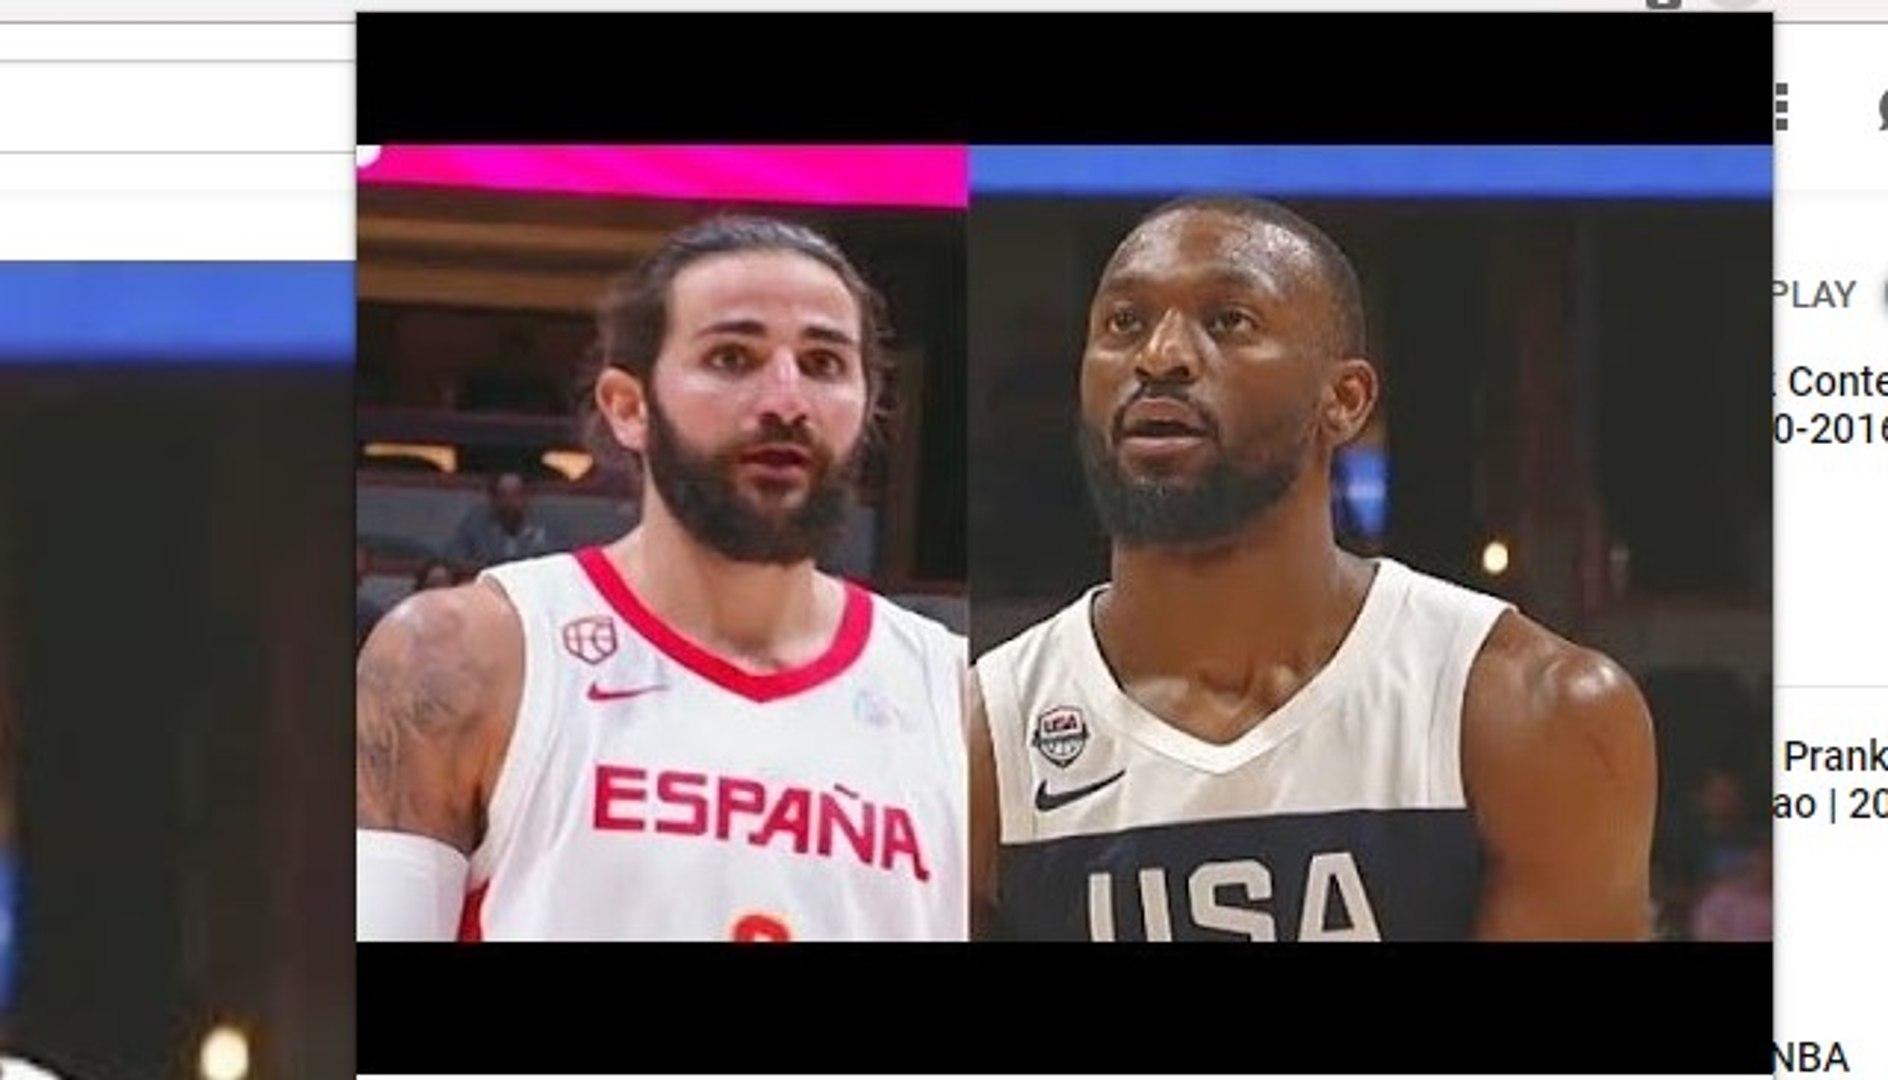 USA vs Spain Full Game Highlights Exhibition! 2019 Team USA Basketball